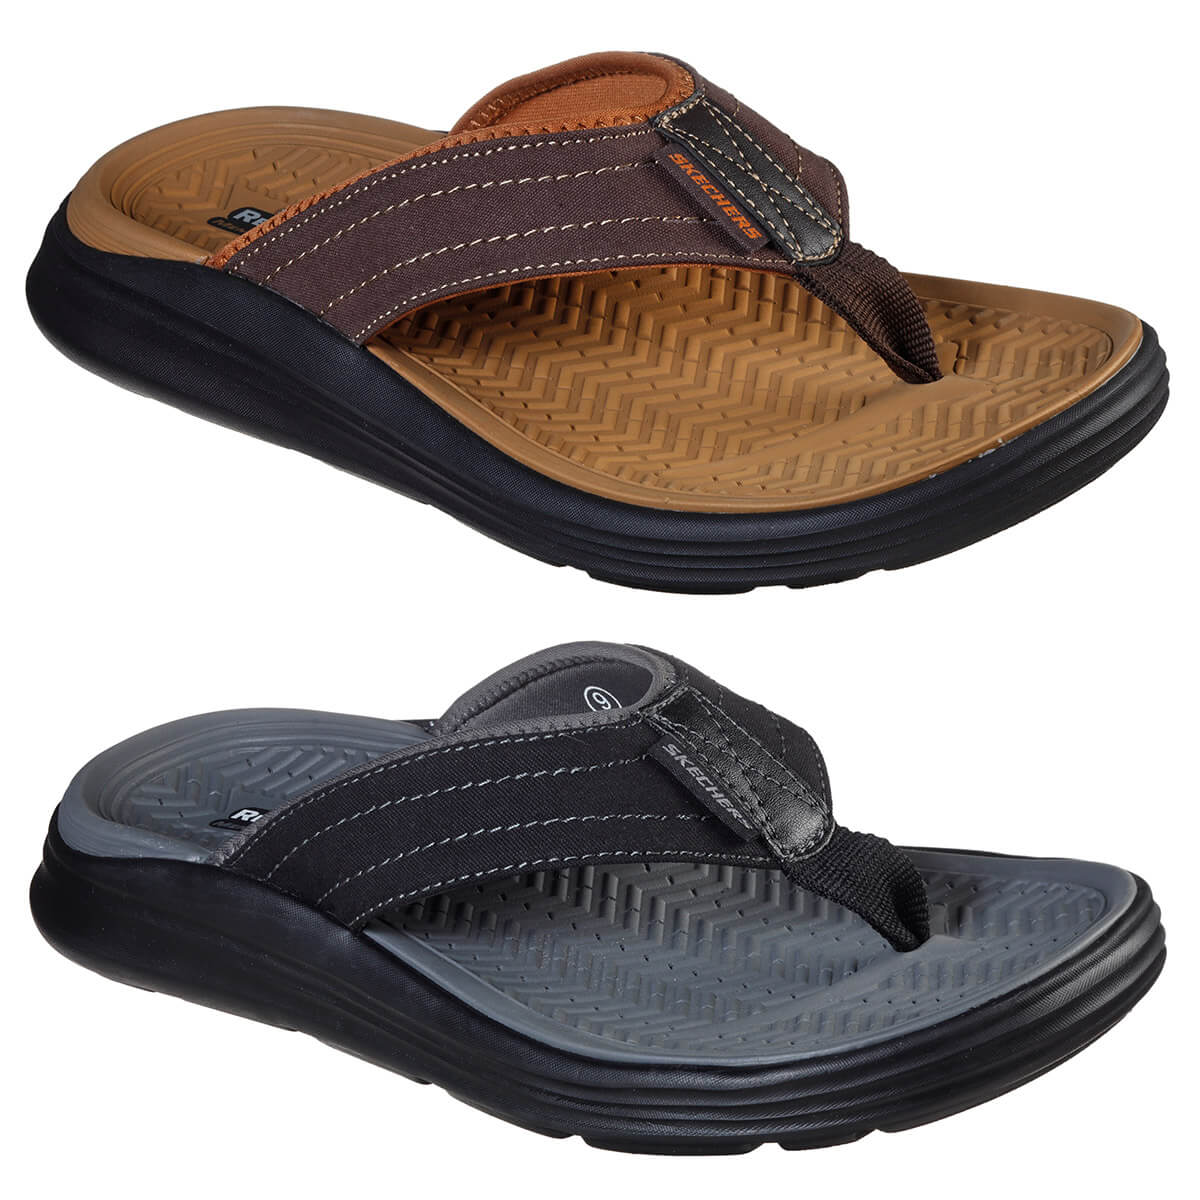 skechers memory foam sandals mens